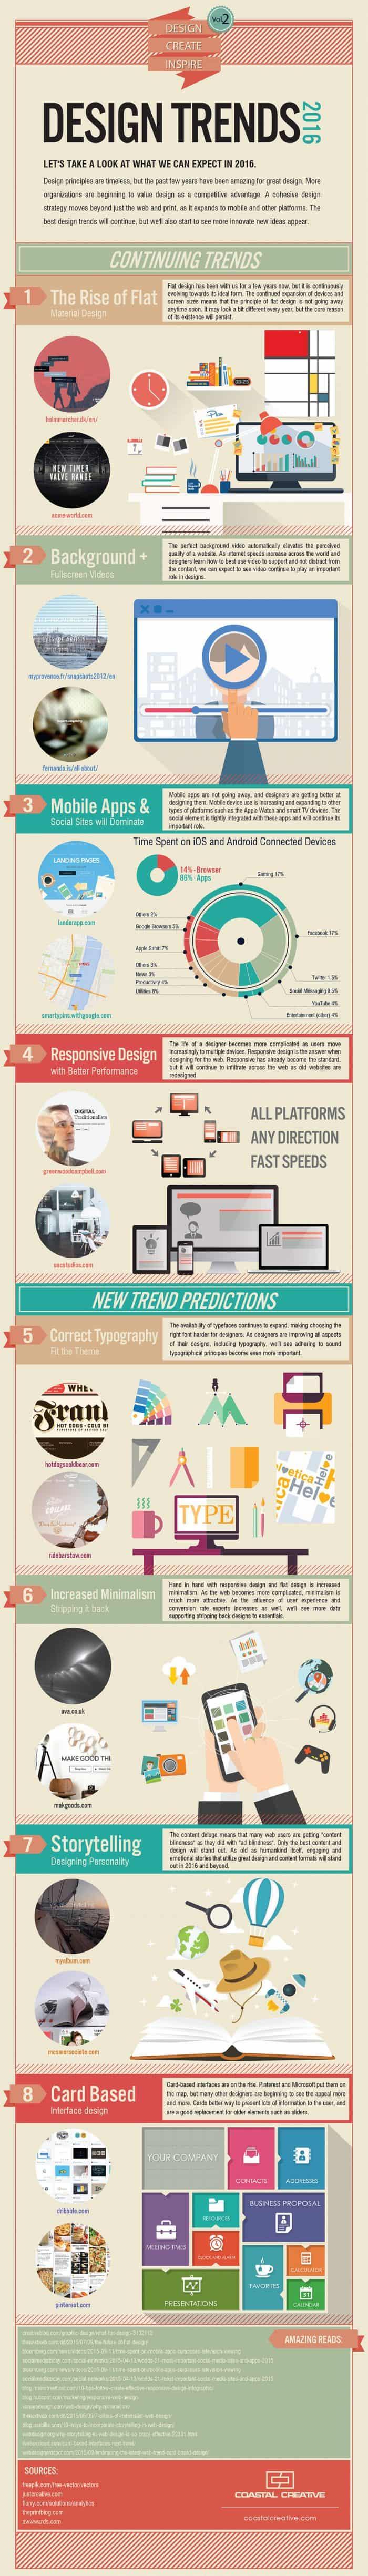 2016 Design Trends Infographic